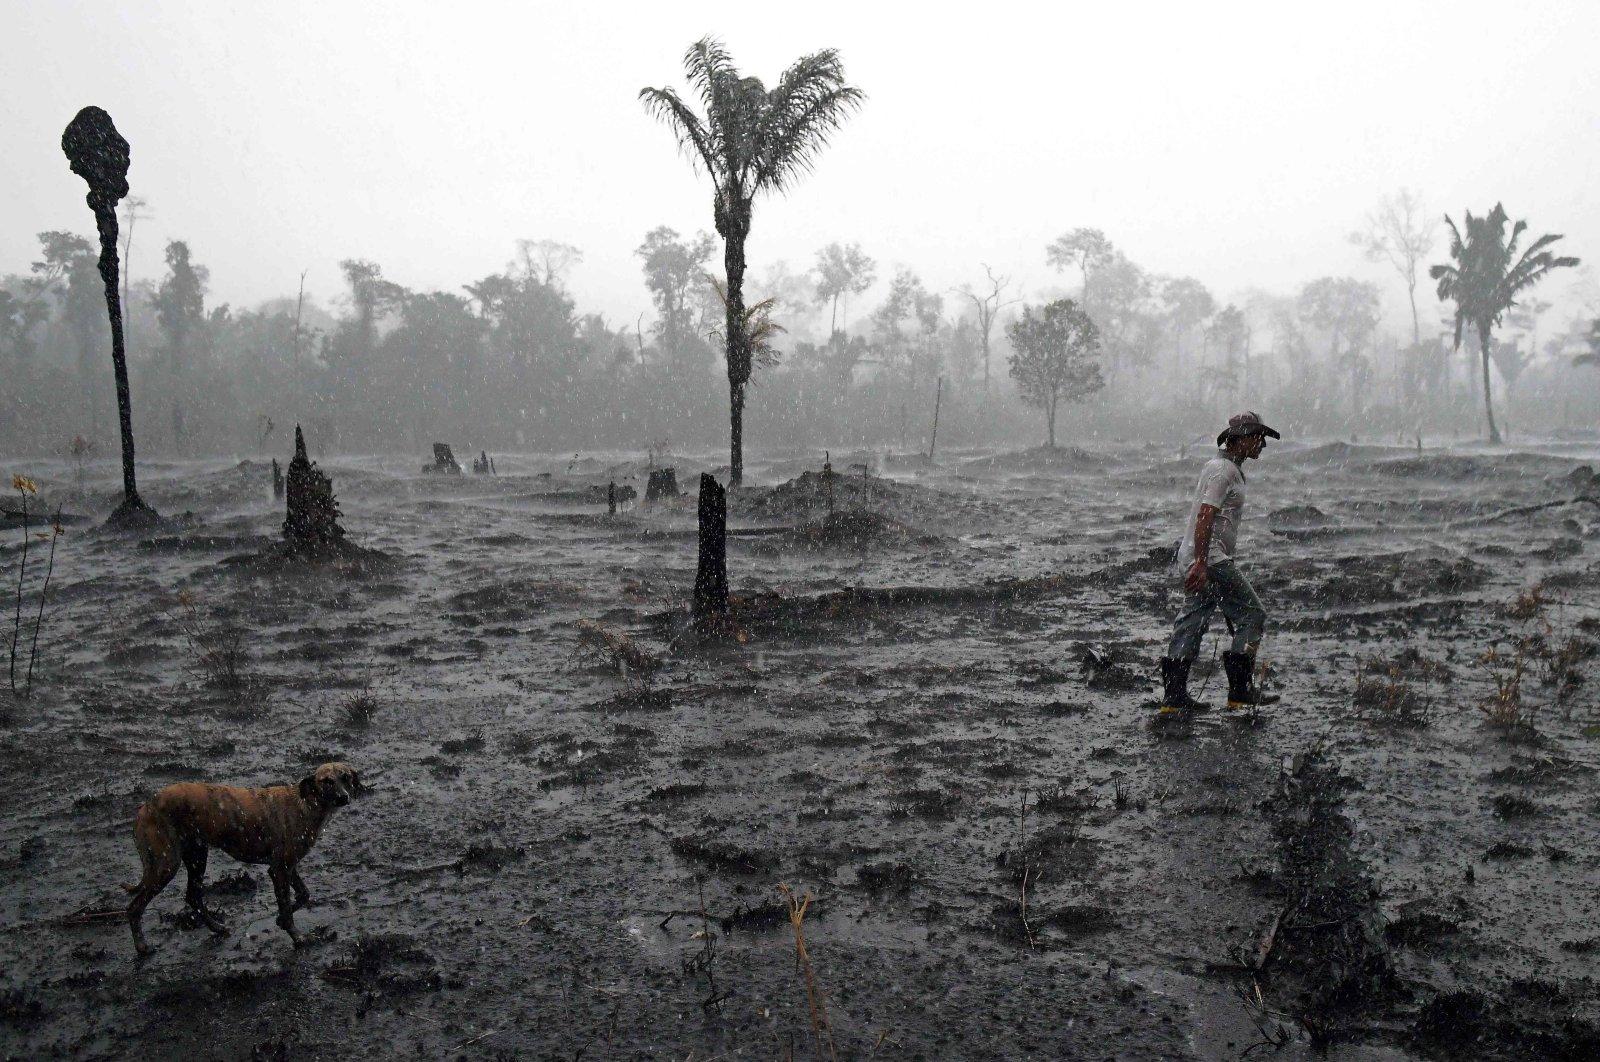 Brazilian farmer Helio Lombardo Do Santos and a dog walk through a burnt area of the Amazon rainforest, near Porto Velho, Rondonia state, Brazil, Aug. 26, 2019. (AFP Photo)